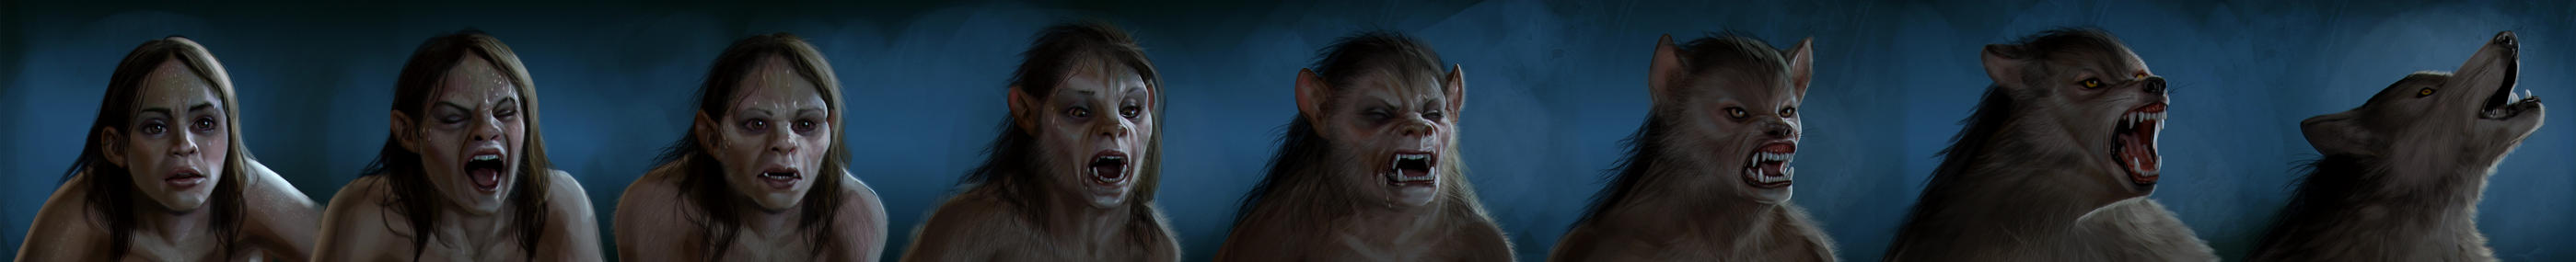 Werewolf Girl Transformation by liminalbean